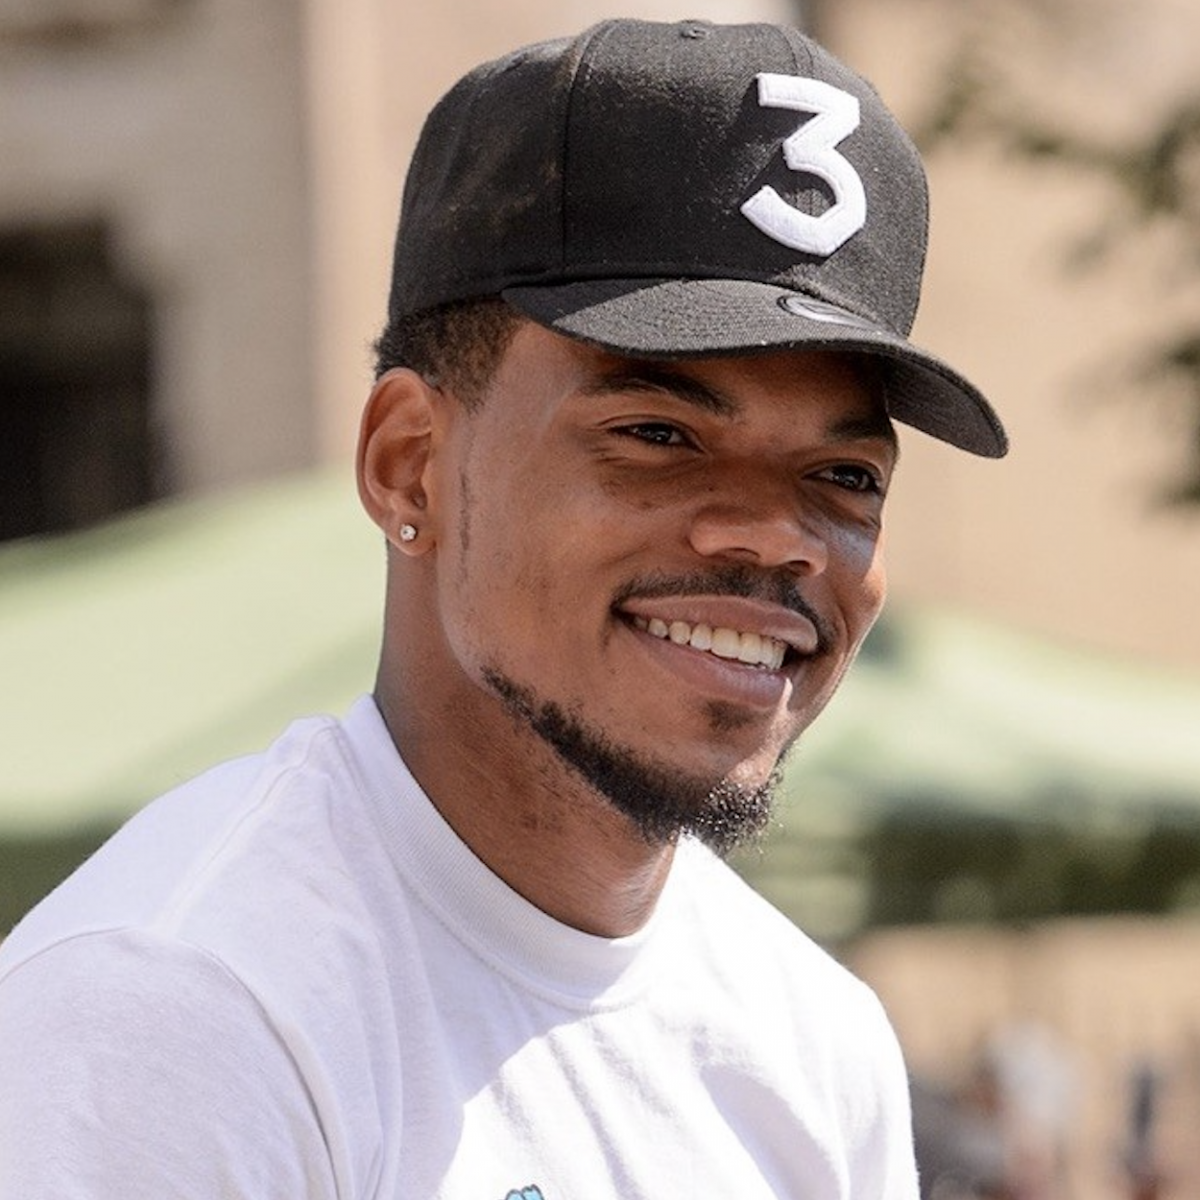 Exclusive: Chance The Rapper Talks Precious Fatherhood Moments During Quarantine